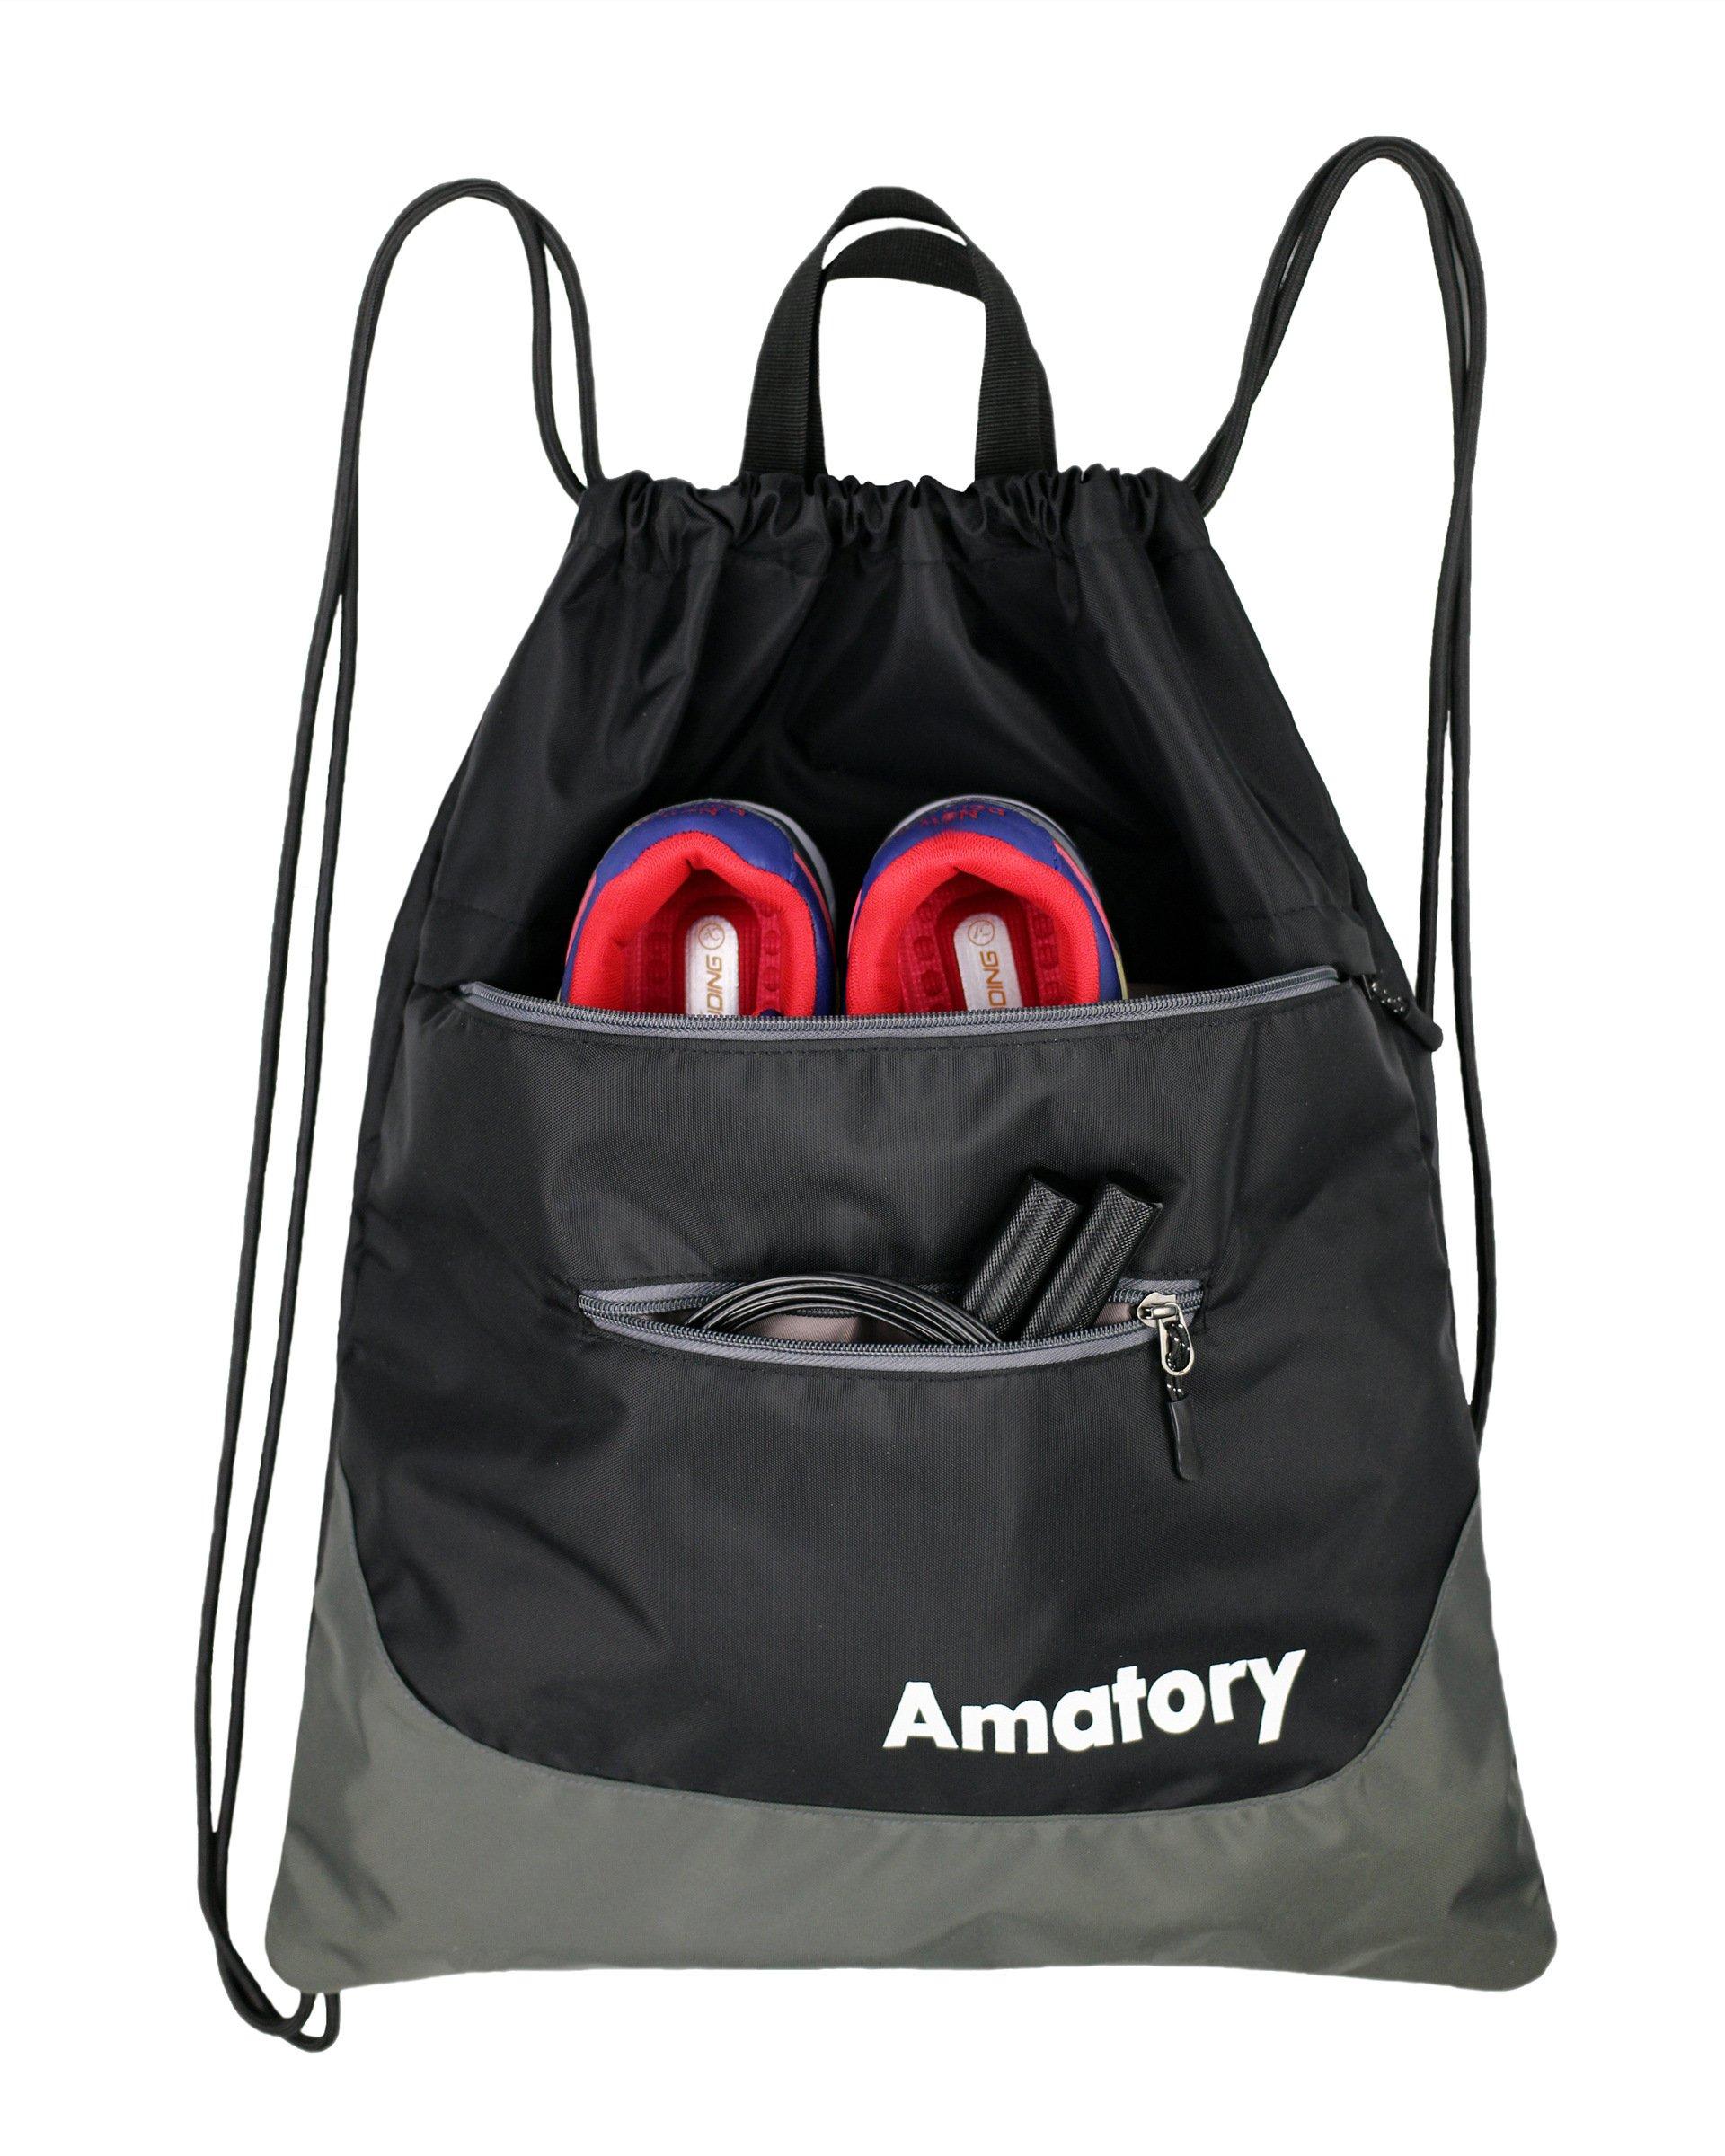 Drawstring Backpack Sports Gym String Bag Cinch Sack Gymsack Sackpack Waterproof (Black)